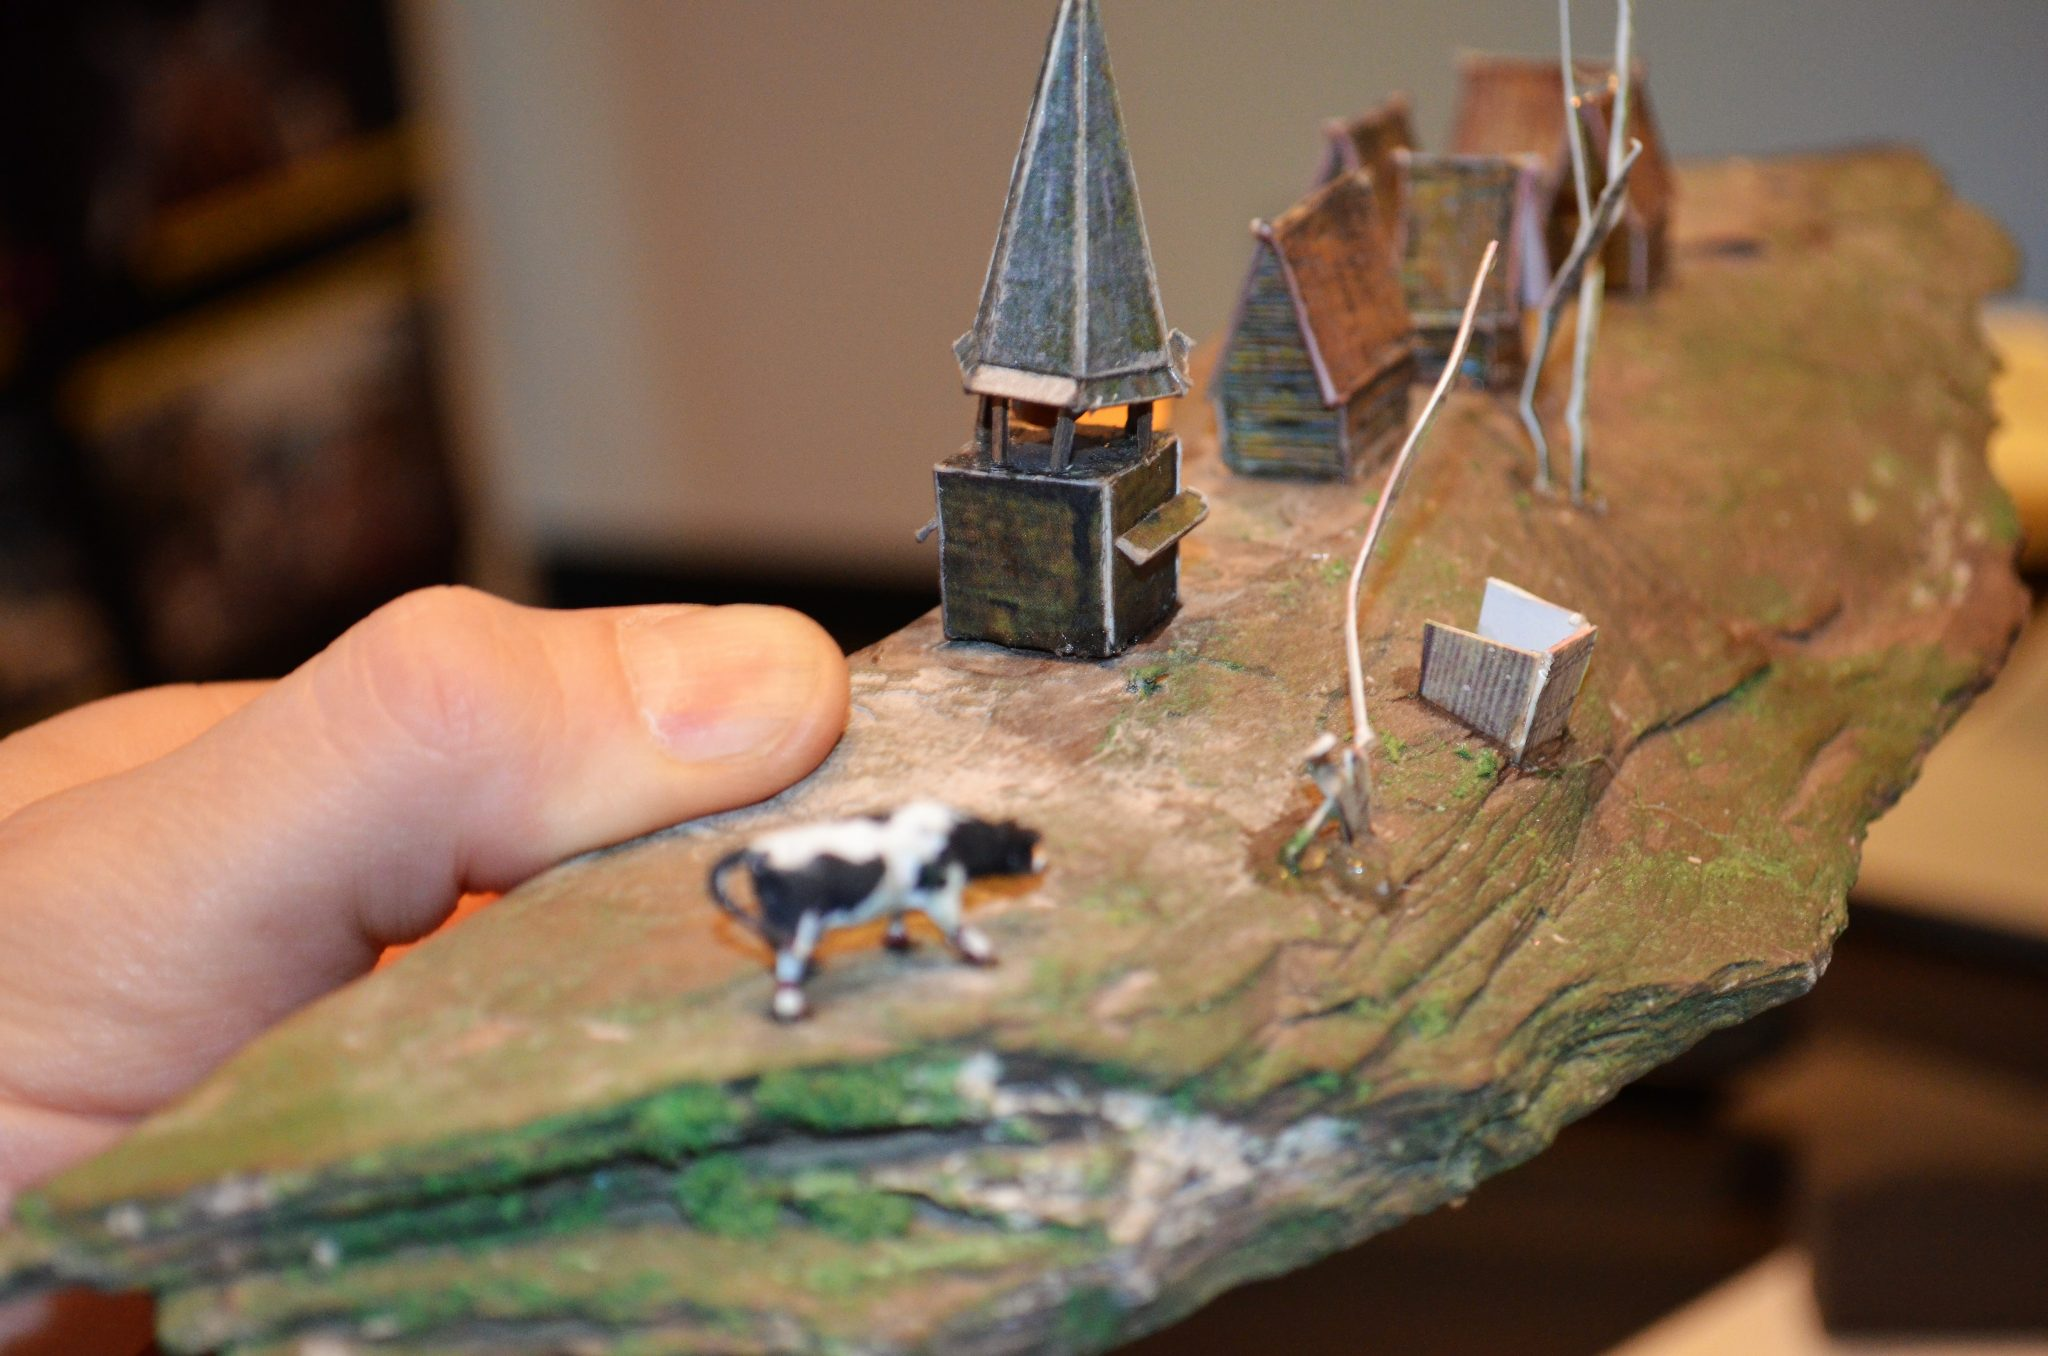 Island miniature model